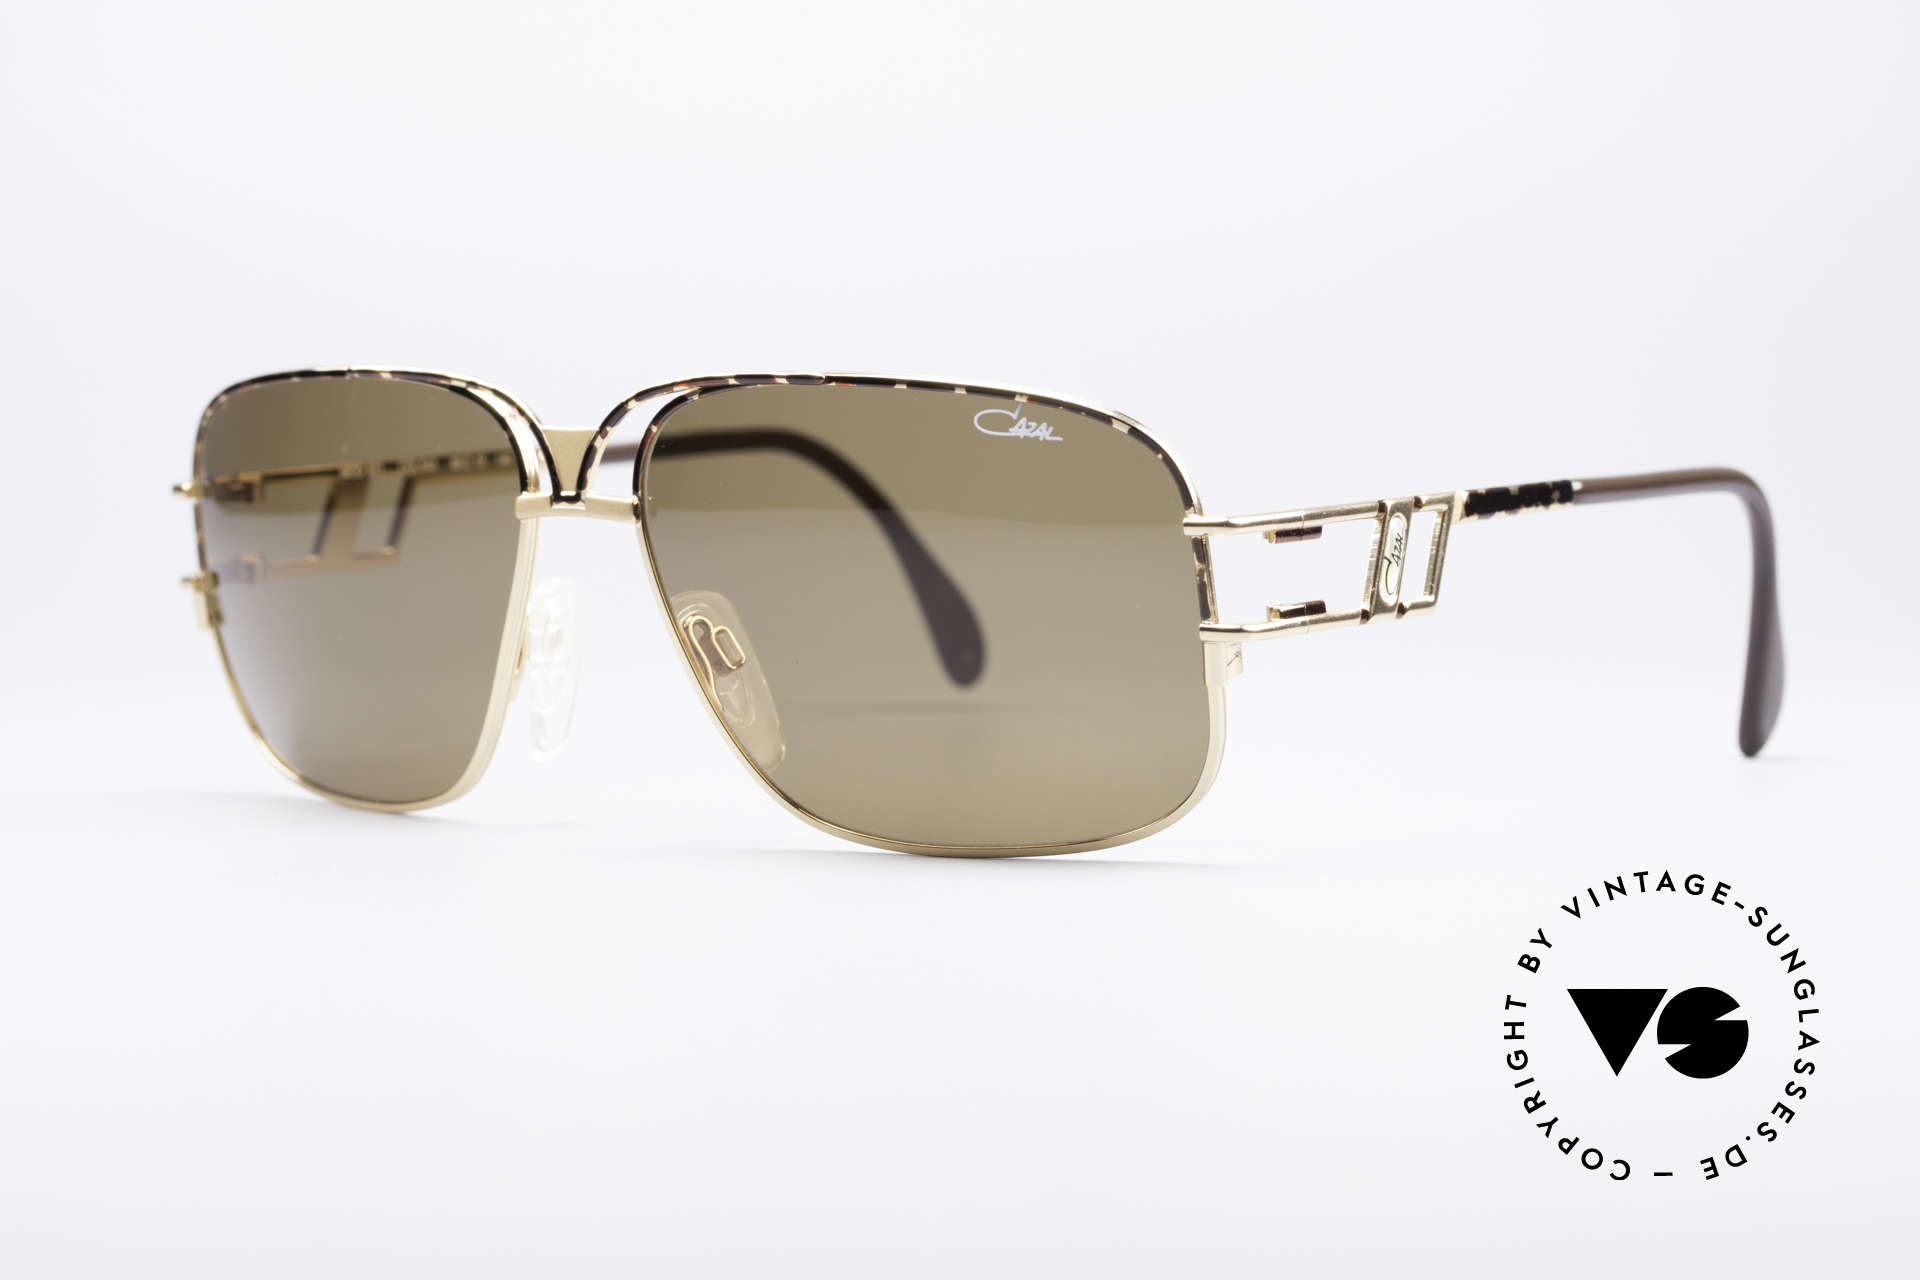 Cazal 971 Ultra Rare Designer Shades, very interesting frame design (something really different), Made for Men